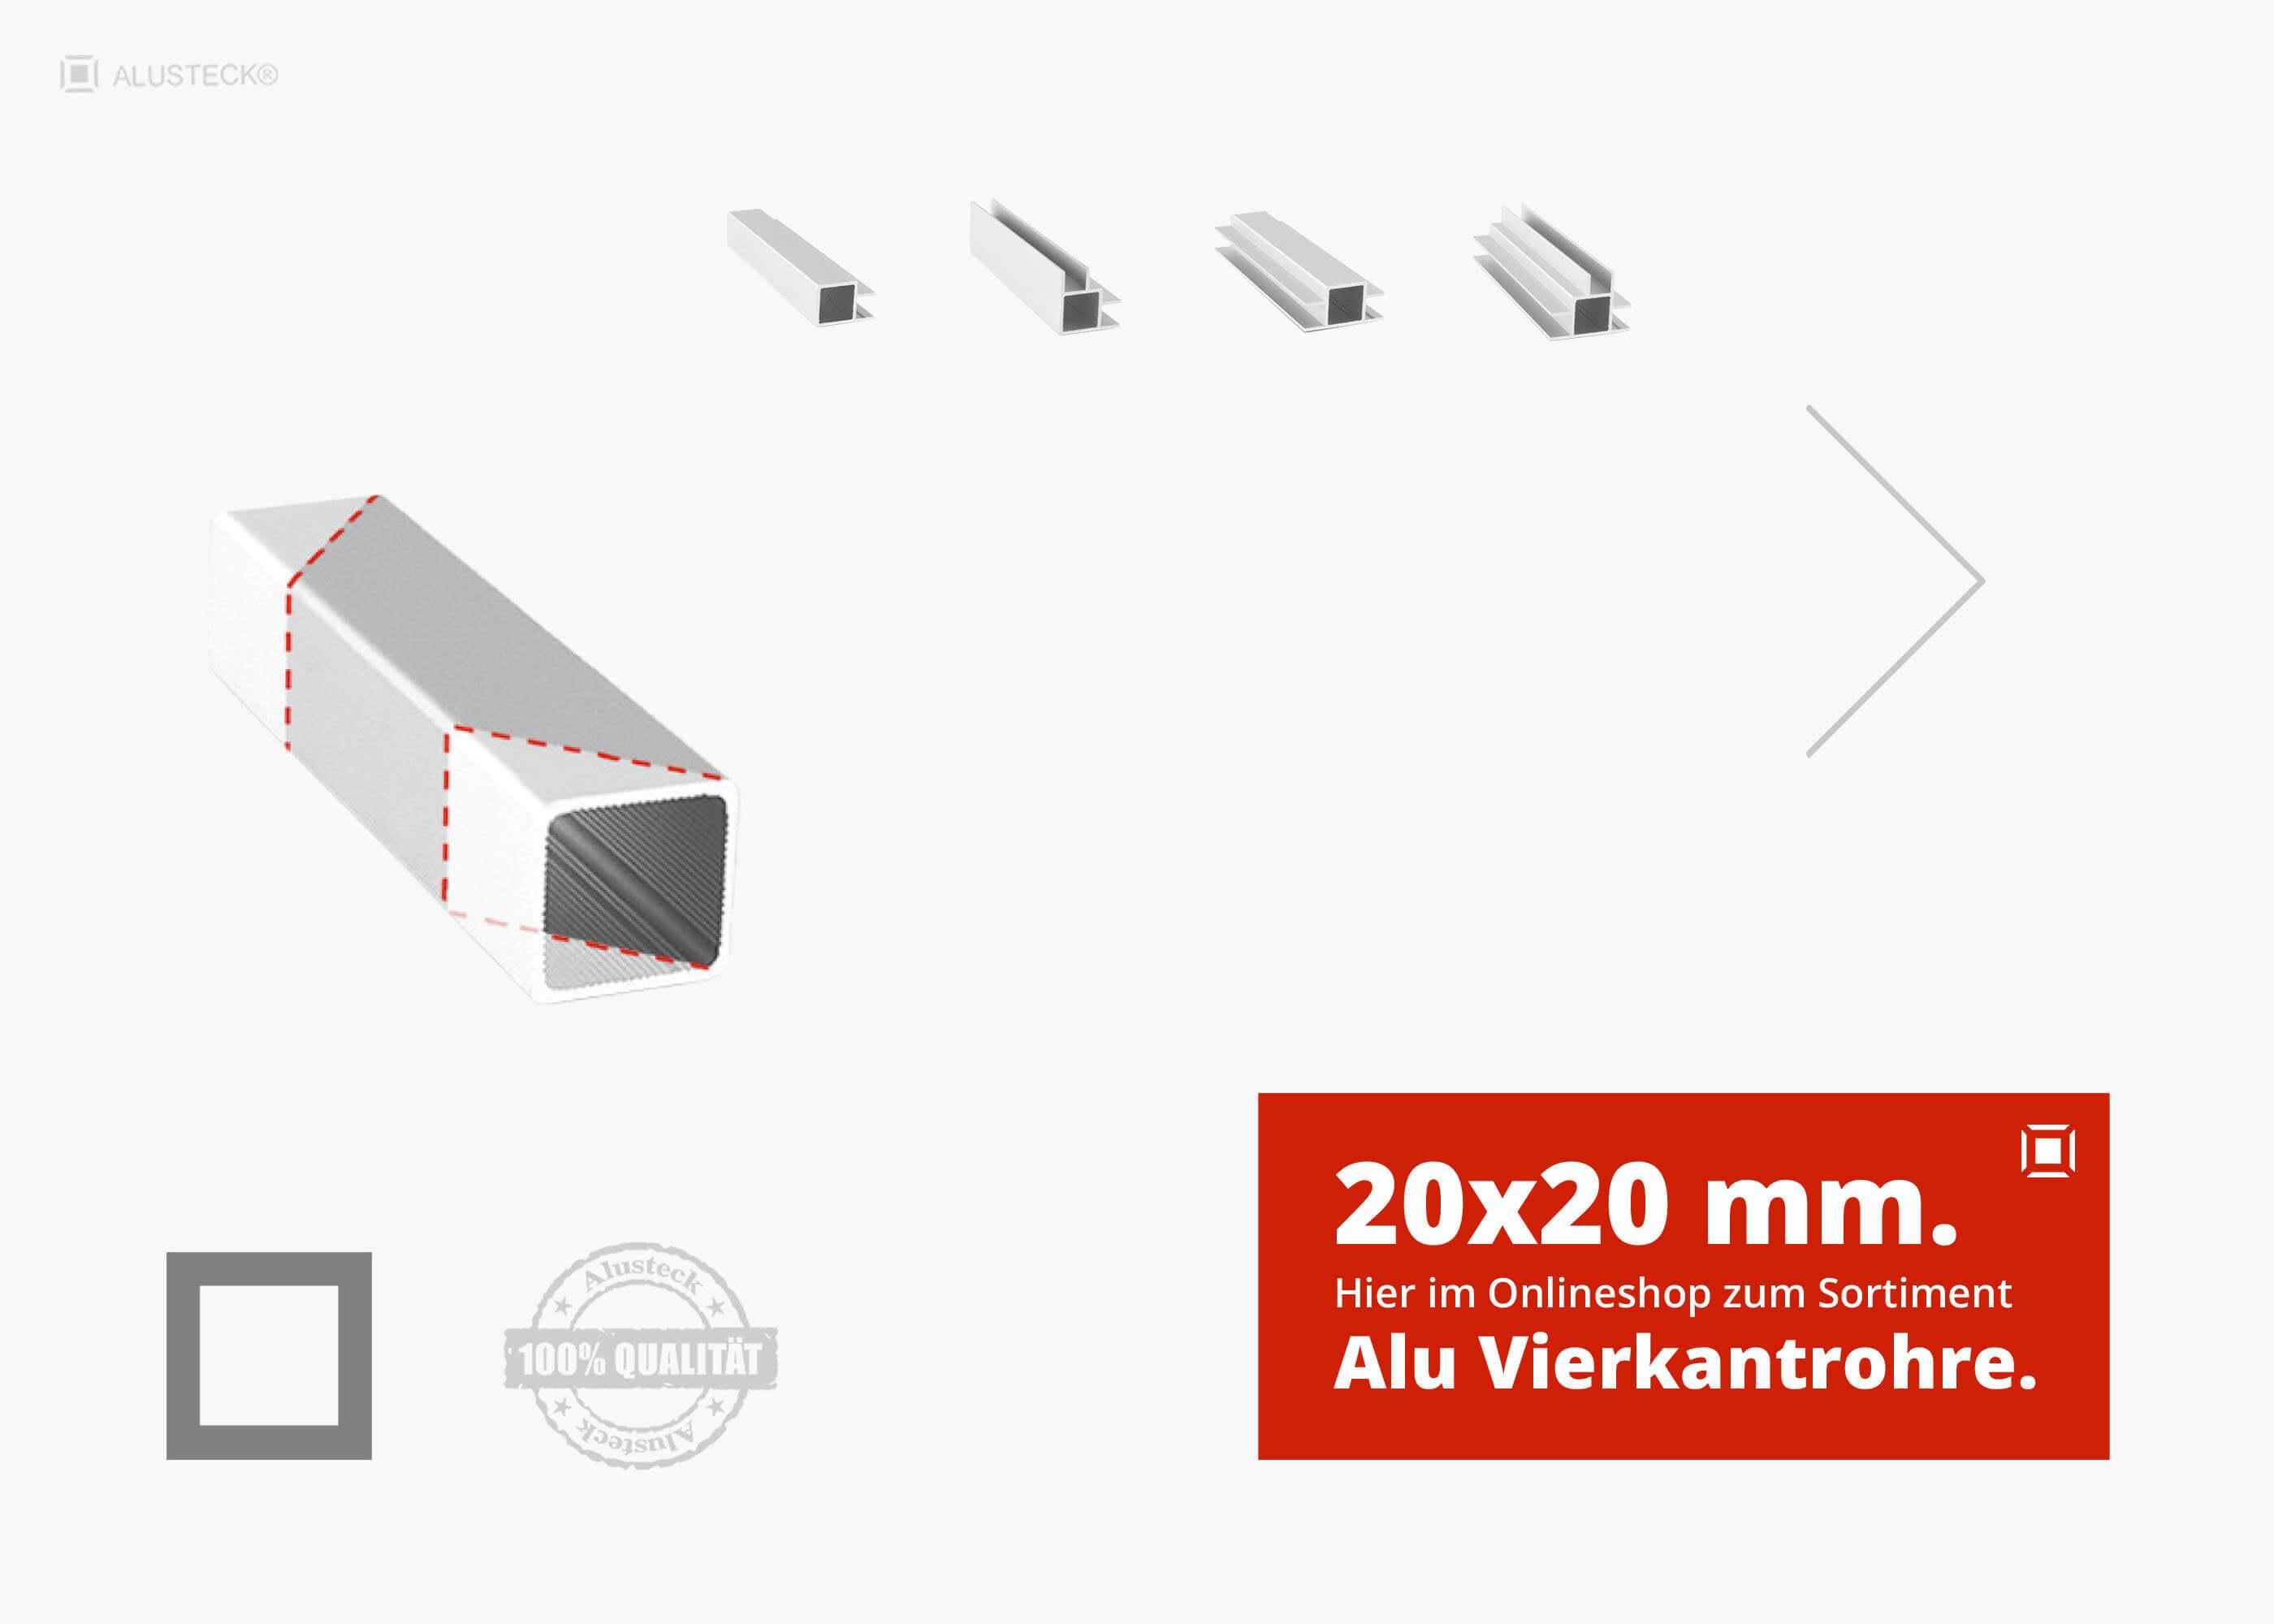 L: 1400mm Aluminium Vierkantrohr AW-6060-10x10x1,5mm 140cm auf Zuschnitt